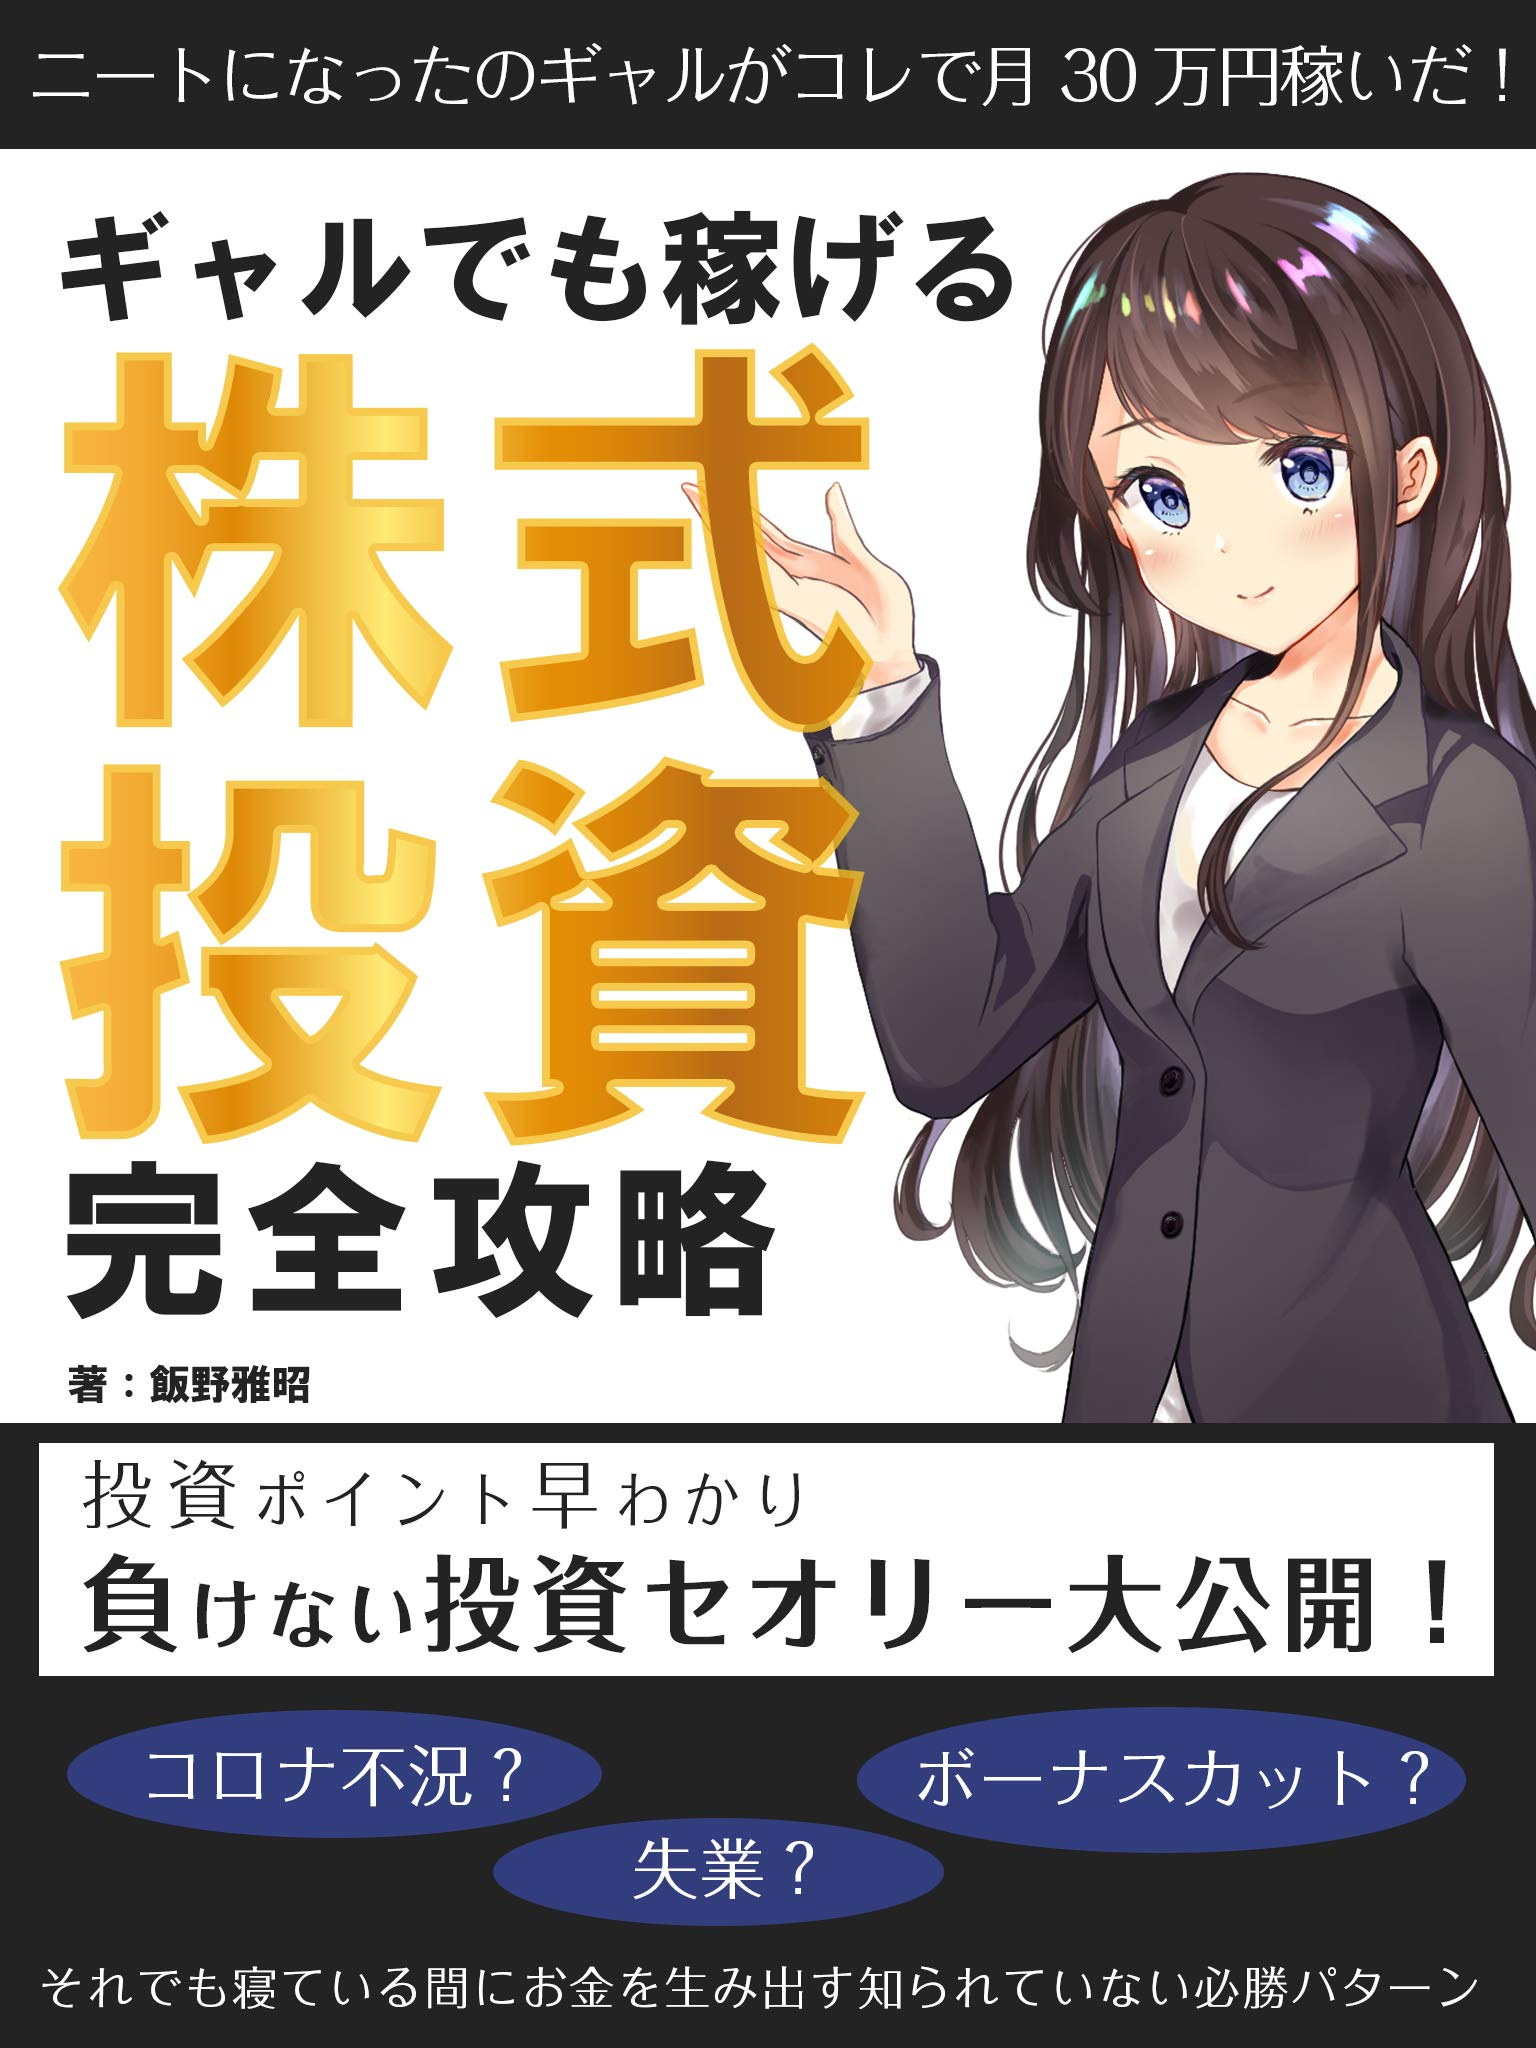 gyarudemokasegerukabushikitoushikanzenkouryakudatsusarakasegikatadokusyagenteitokutentsuki: nitoninattagyarugakoredetsukisanjyuumanenkaseida (Japanese Edition)